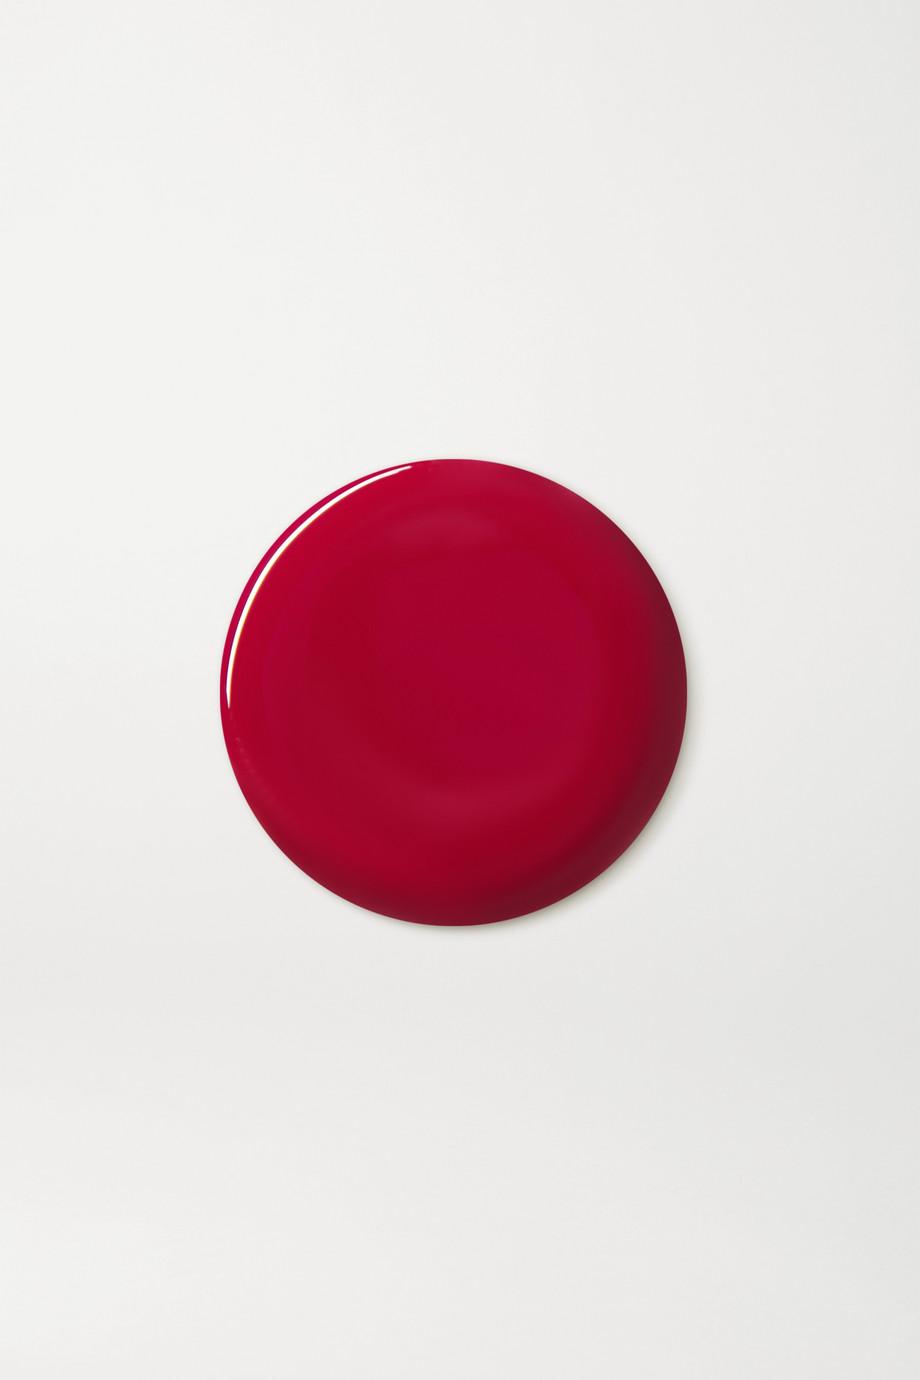 Christian Louboutin Beauty Matte Nail Color - Multimiss